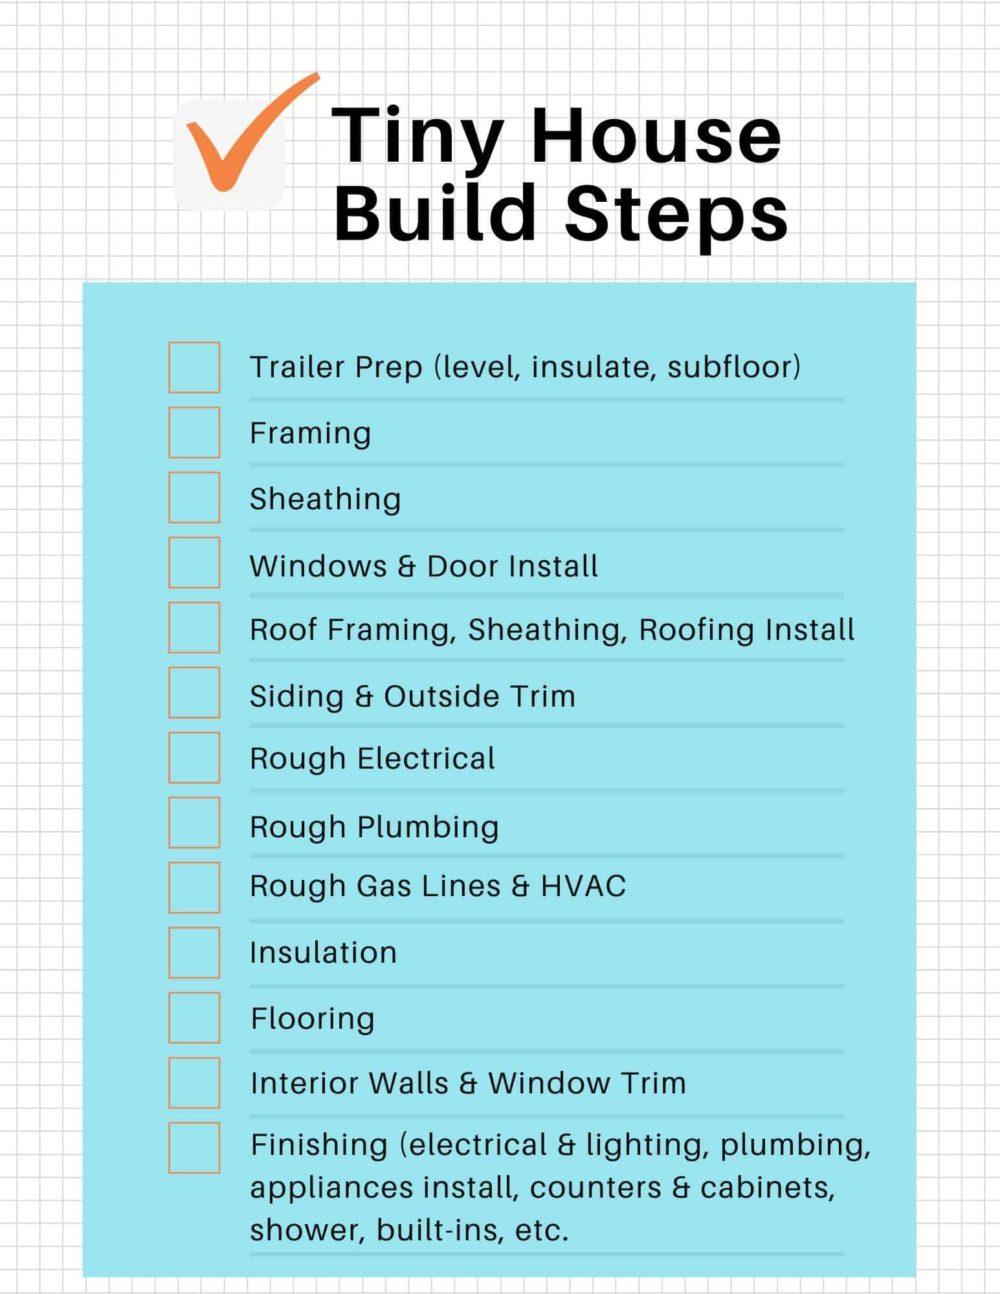 Tiny house build checklist.